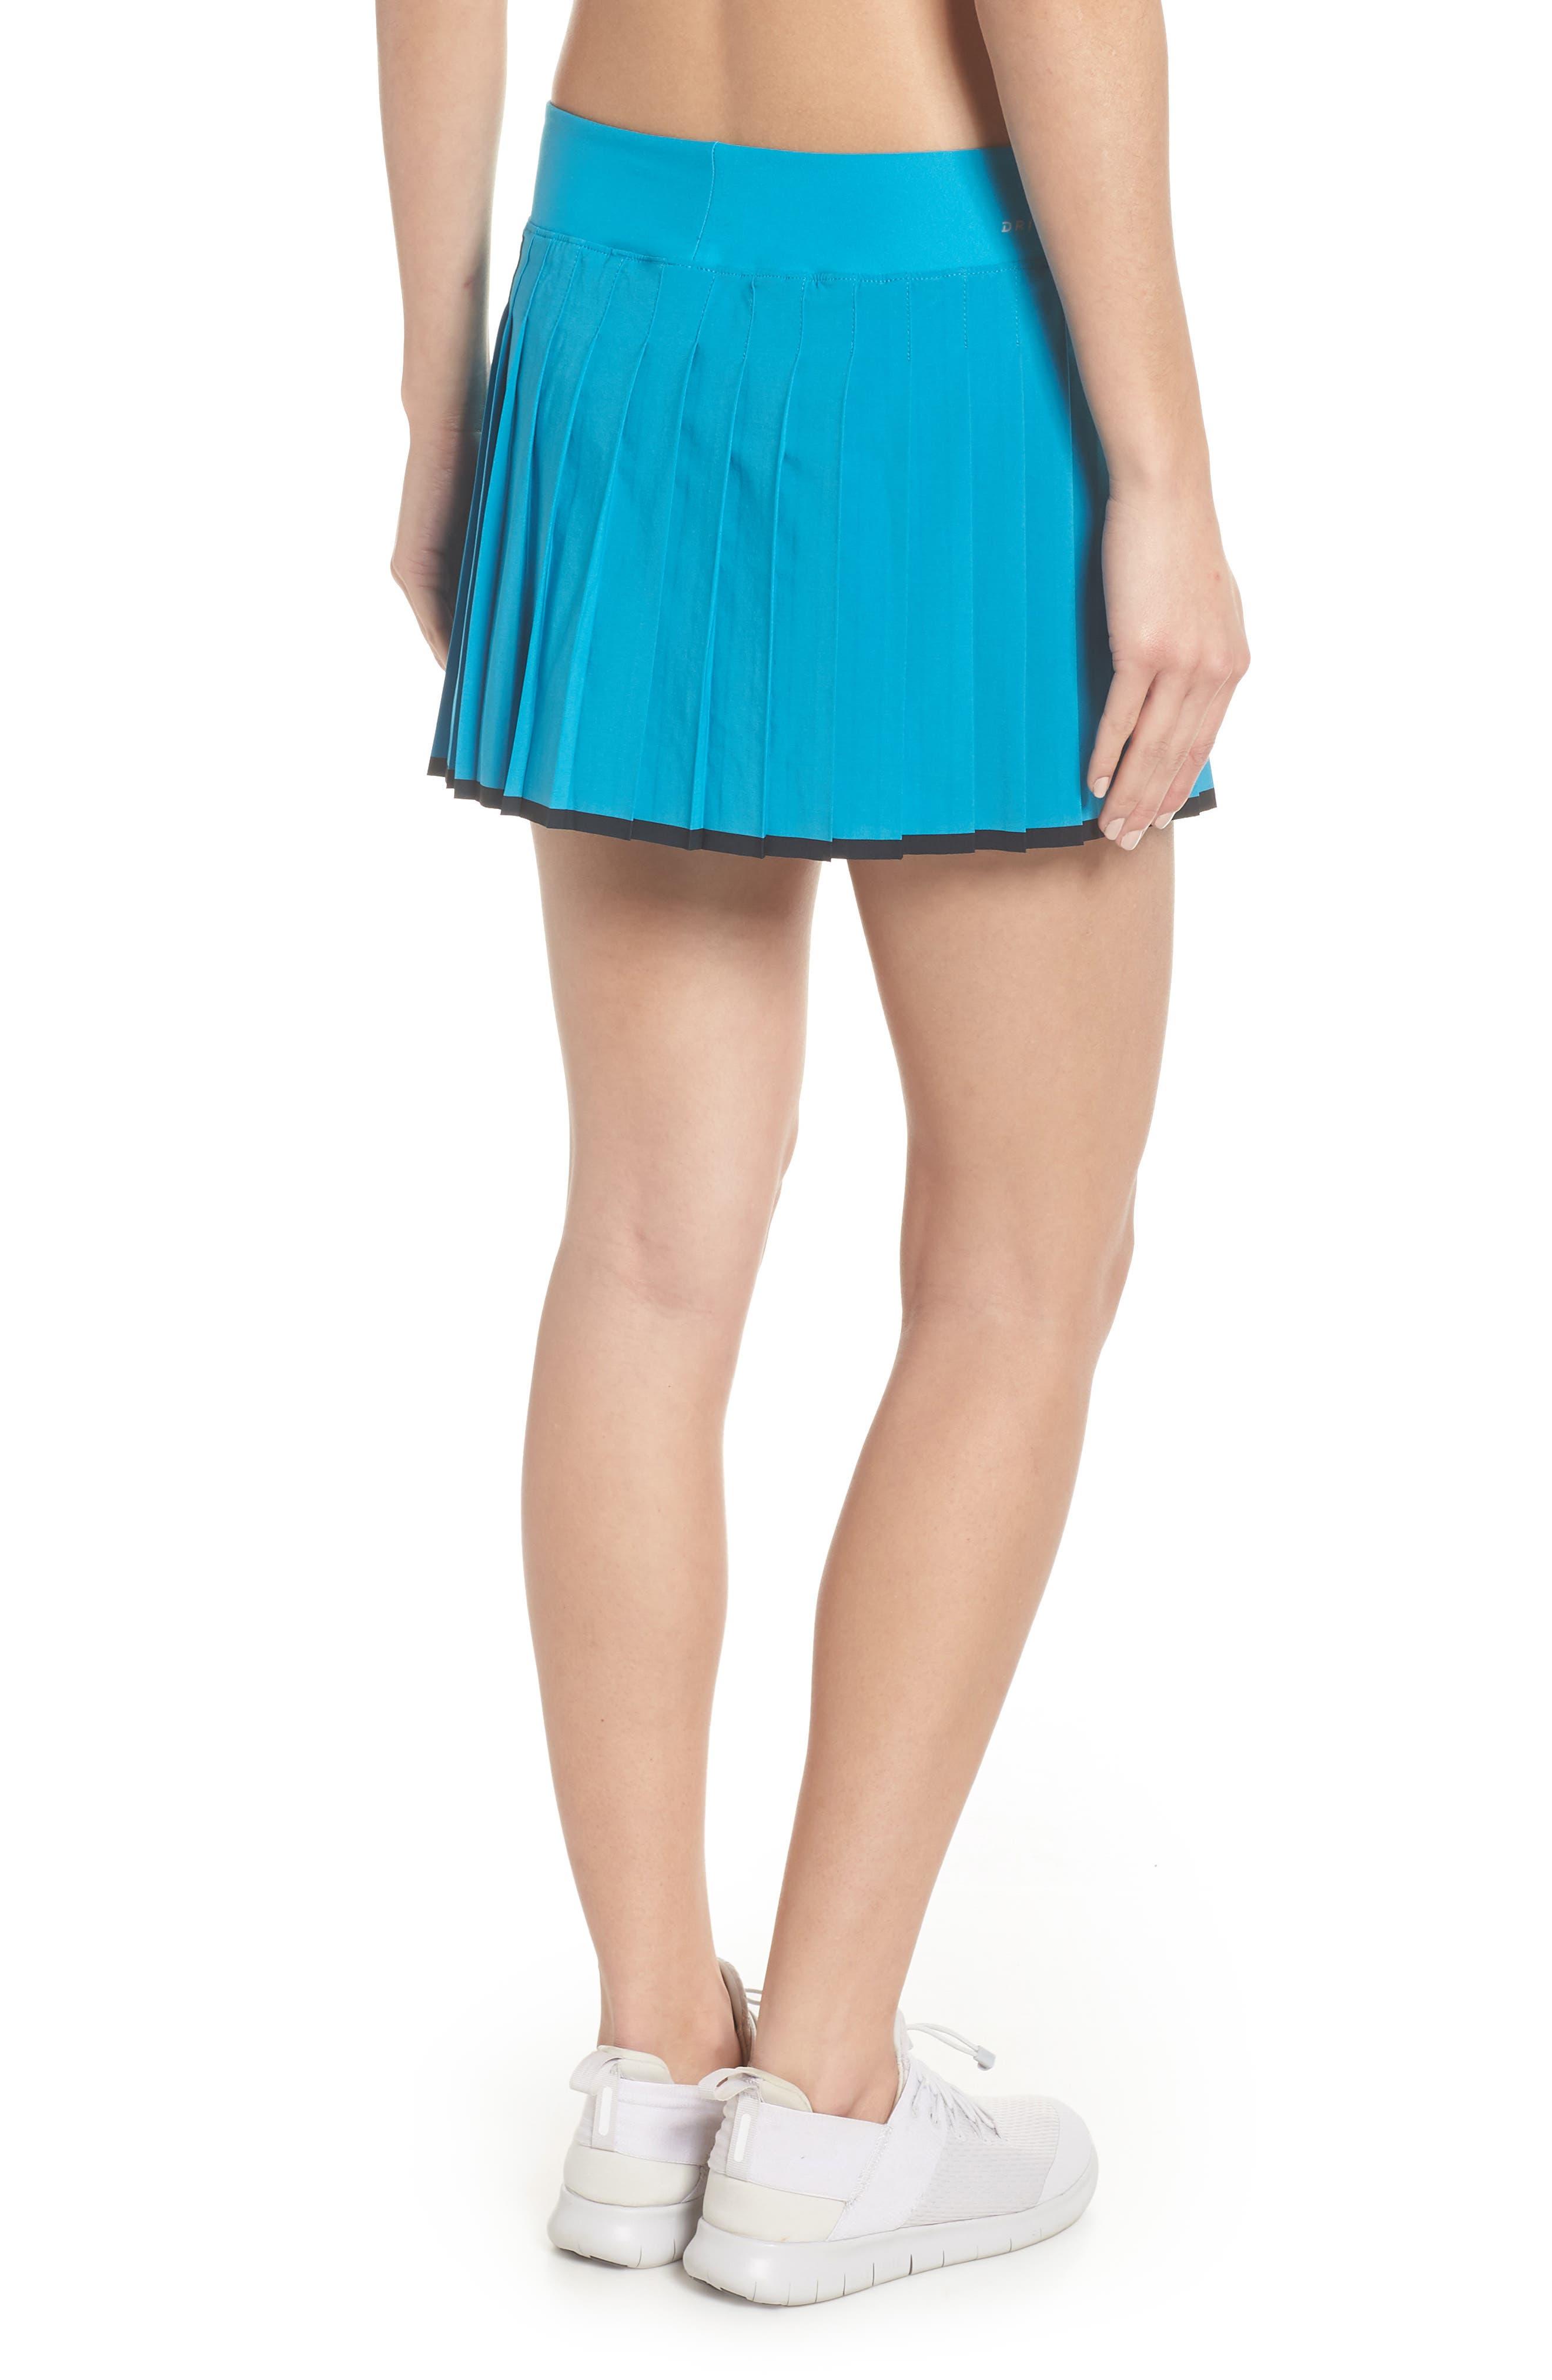 'Victory' Pleat Dri-FIT Tennis Skirt,                             Alternate thumbnail 2, color,                             Neo Turquoise/ Black